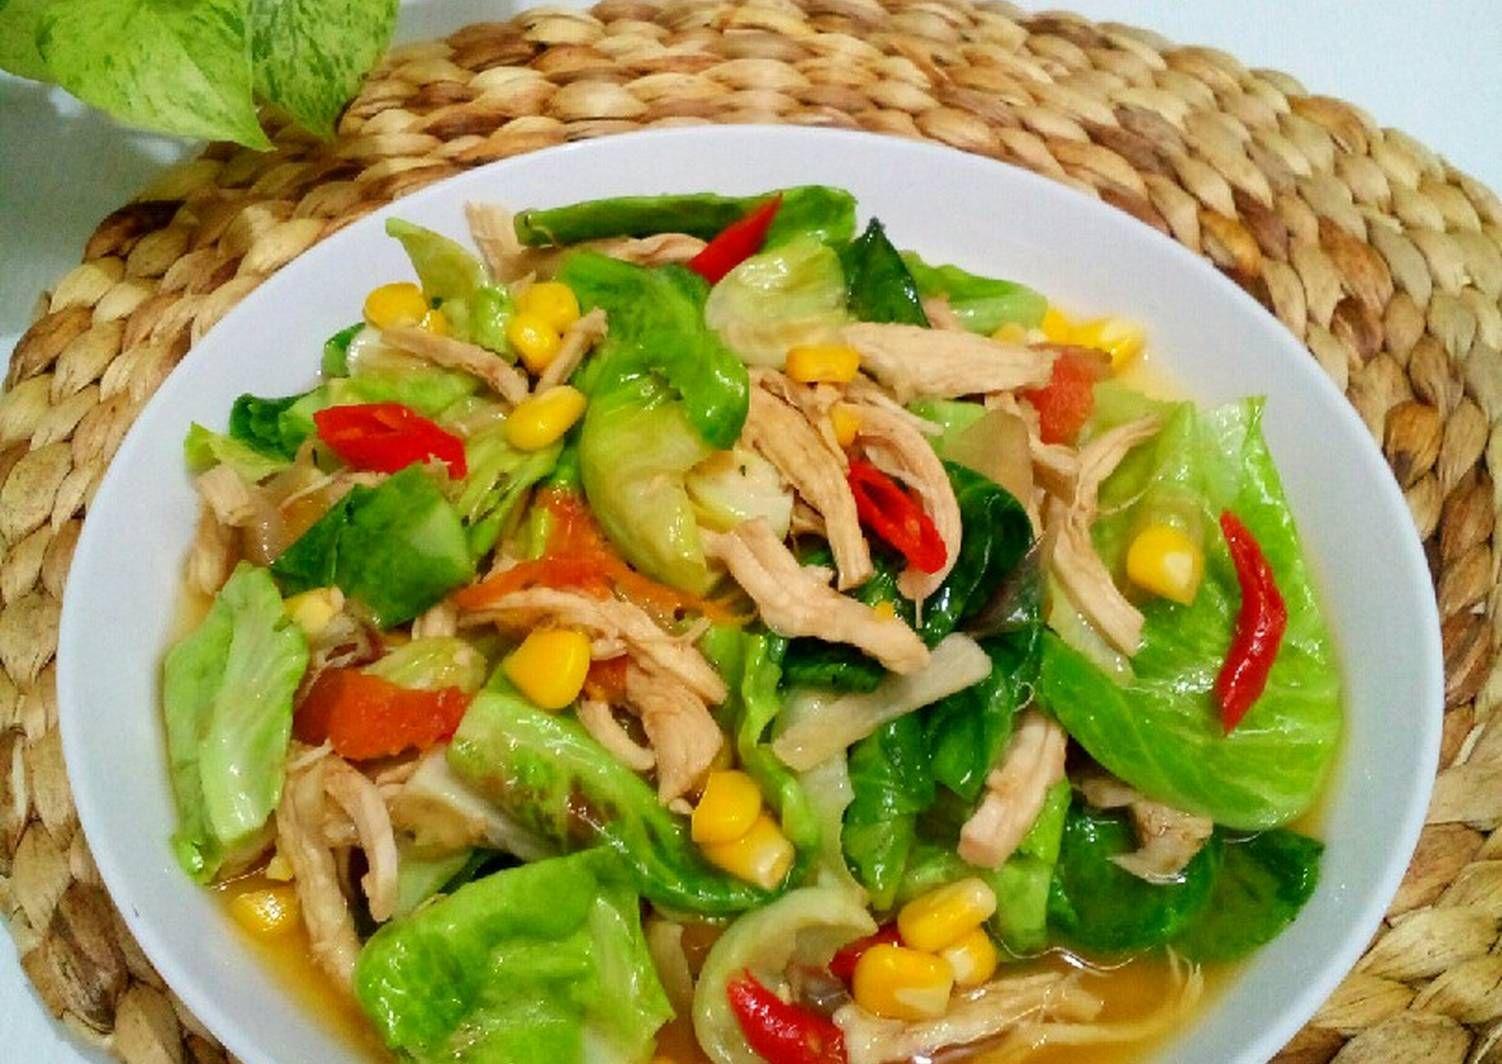 Resep Cuciwis Tumis Ayam Suwir Recipe In 2020 Food Chicken Meat